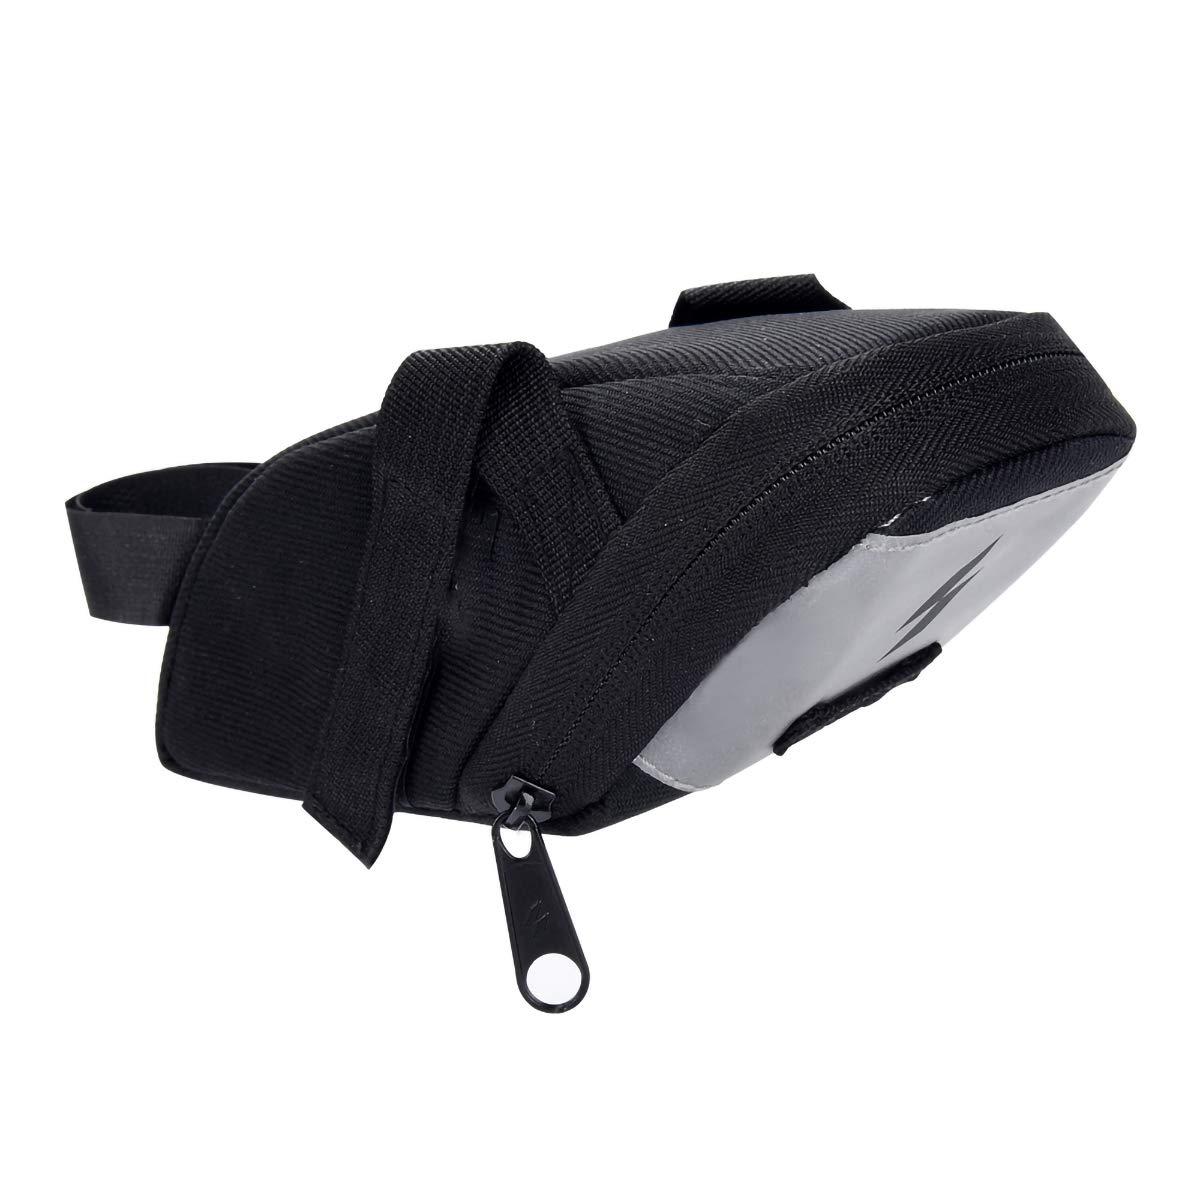 Cycling Bike Saddle Bag, Bicycle Strap-On Saddle Bag Seat Bag Wedge Pack, with Light, Black, 18 * 8.5 * 6cm